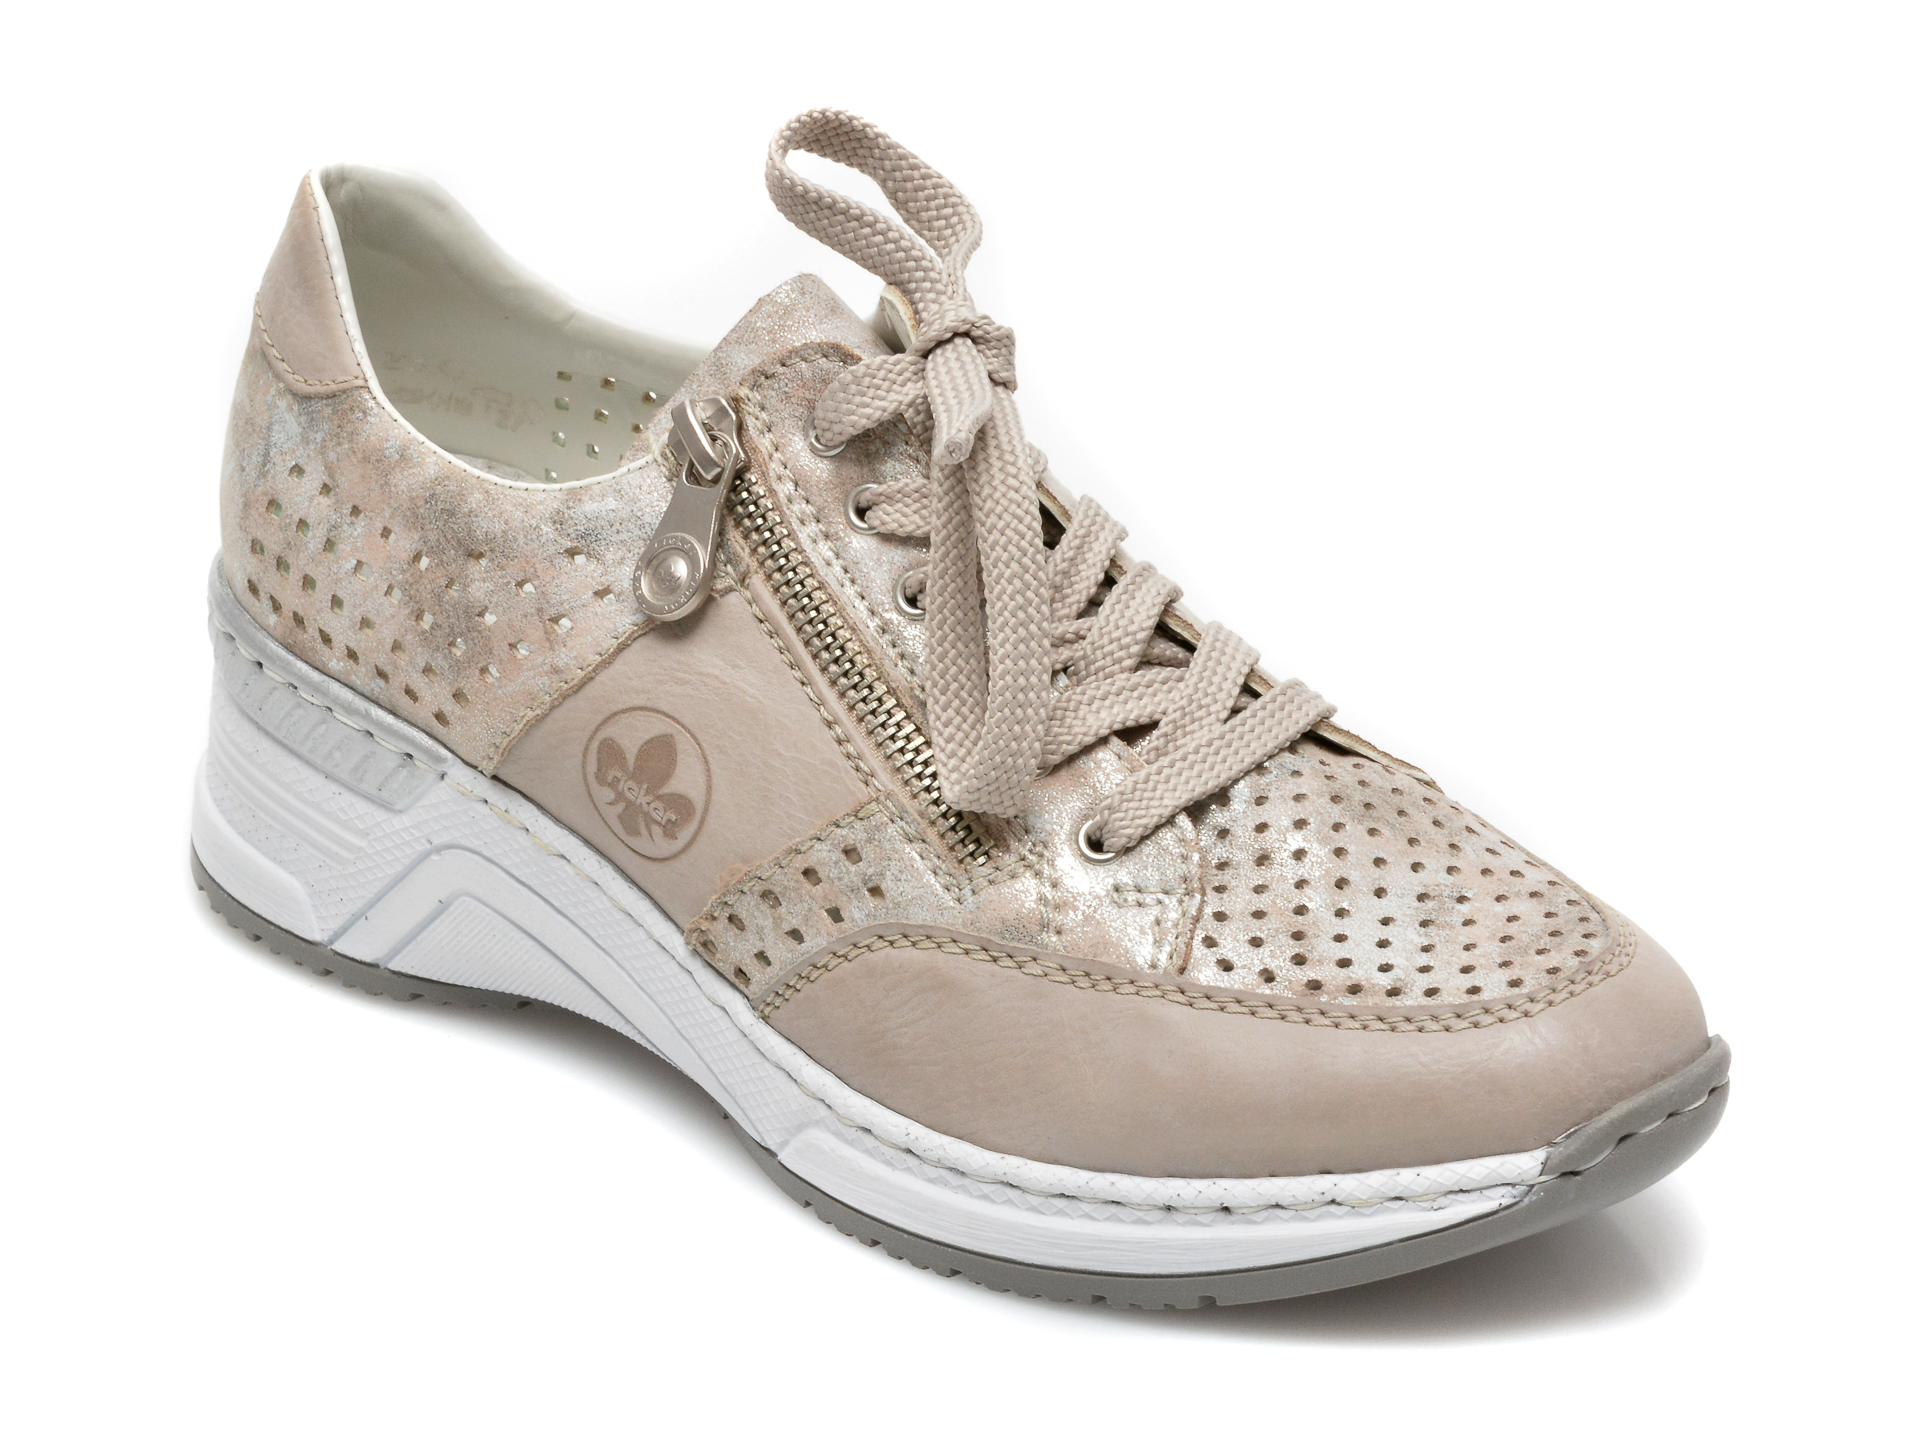 Pantofi RIEKER gri, N4327, din piele ecologica imagine otter.ro 2021